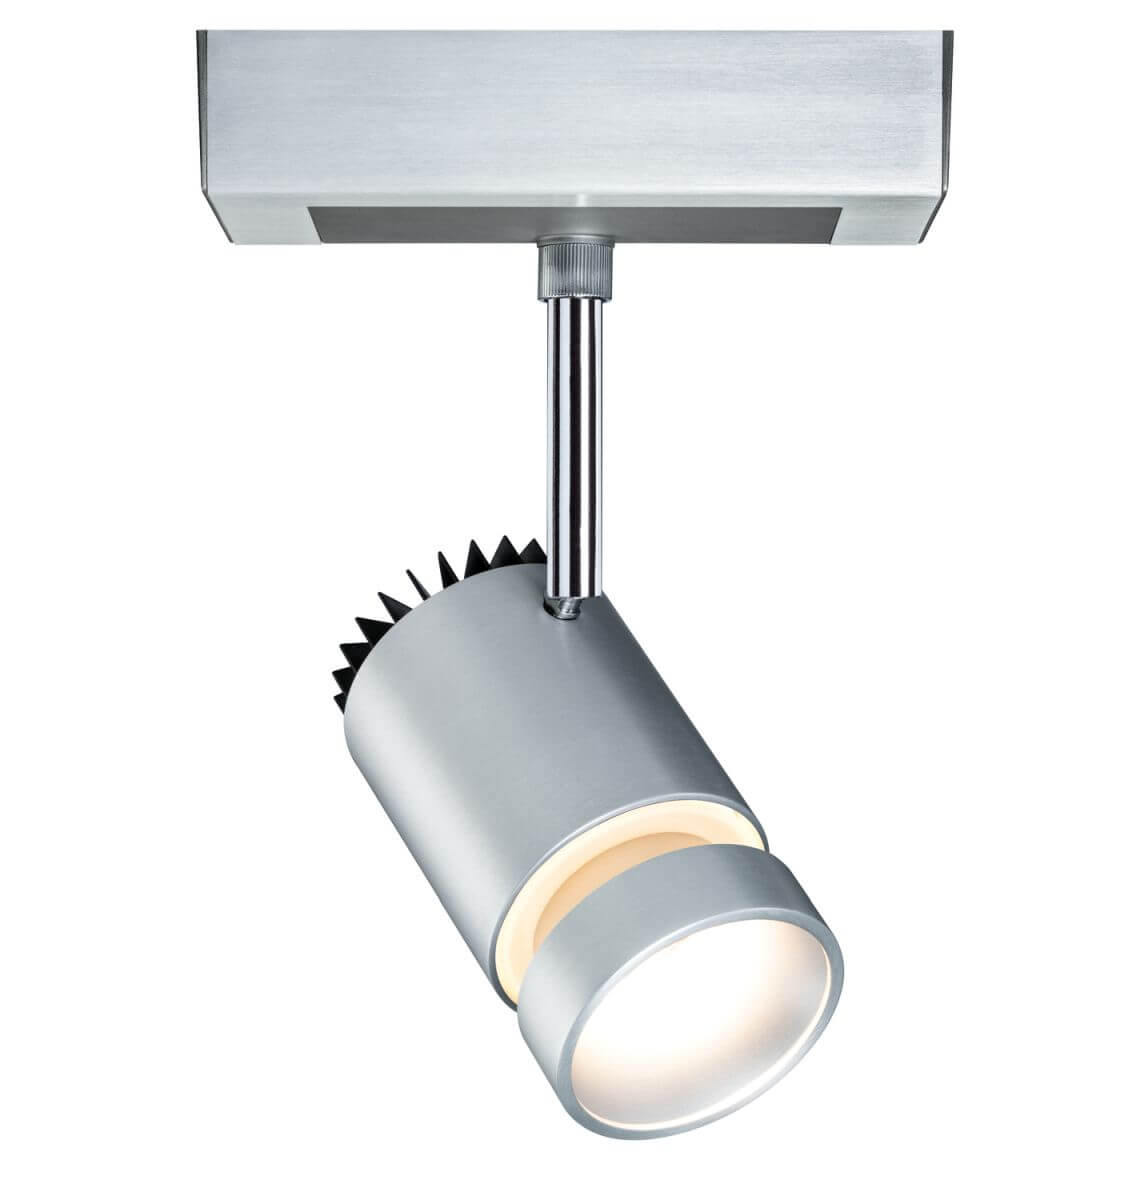 Paulmann VariLine LED Spot Shine für VariLine 2-Phasen-Schienensystem